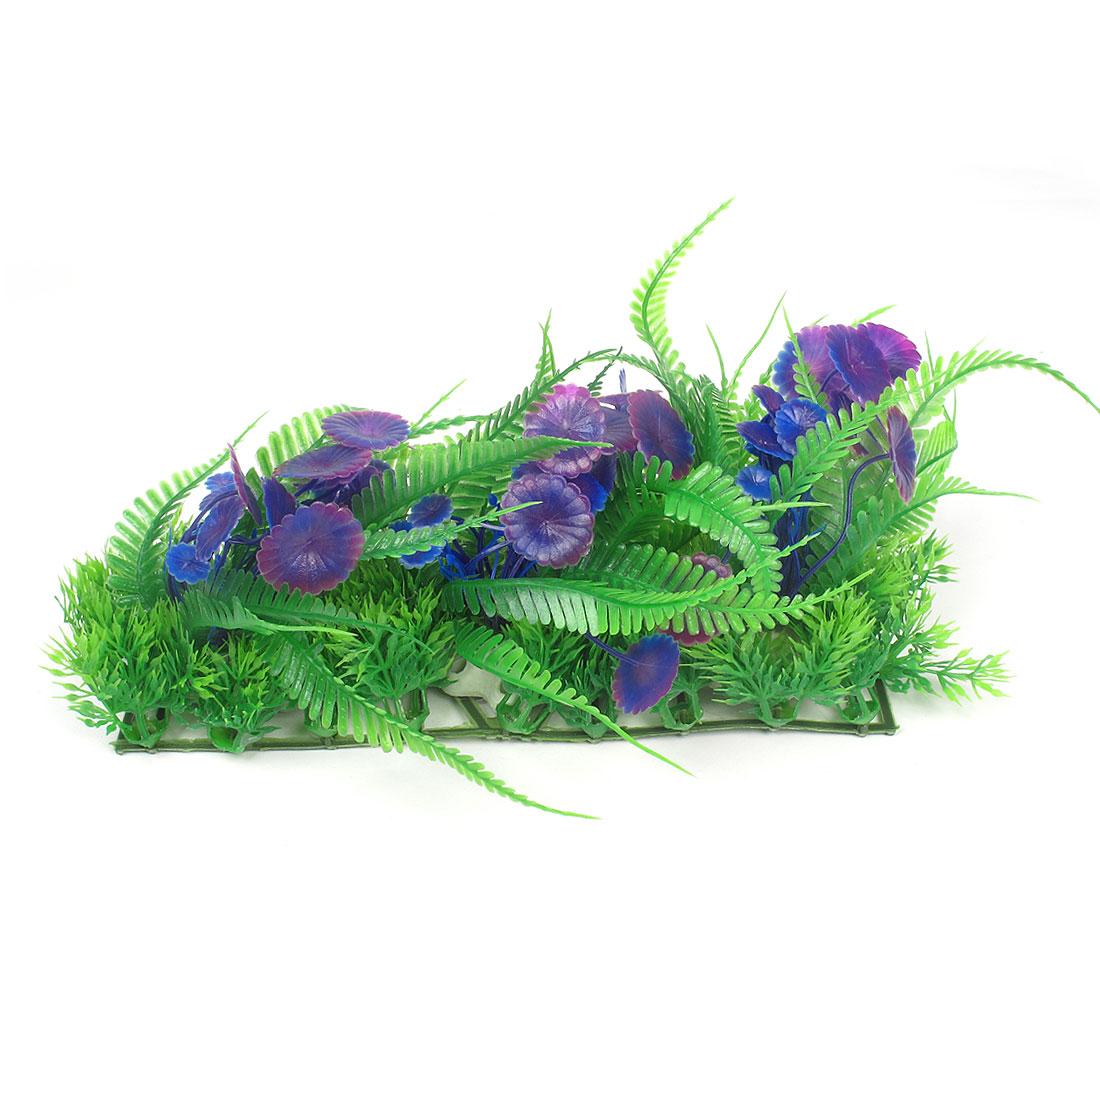 "Fish Tank Ceramic Base Imitated Plants Grass Decor Green Blue Purple 5.9"""